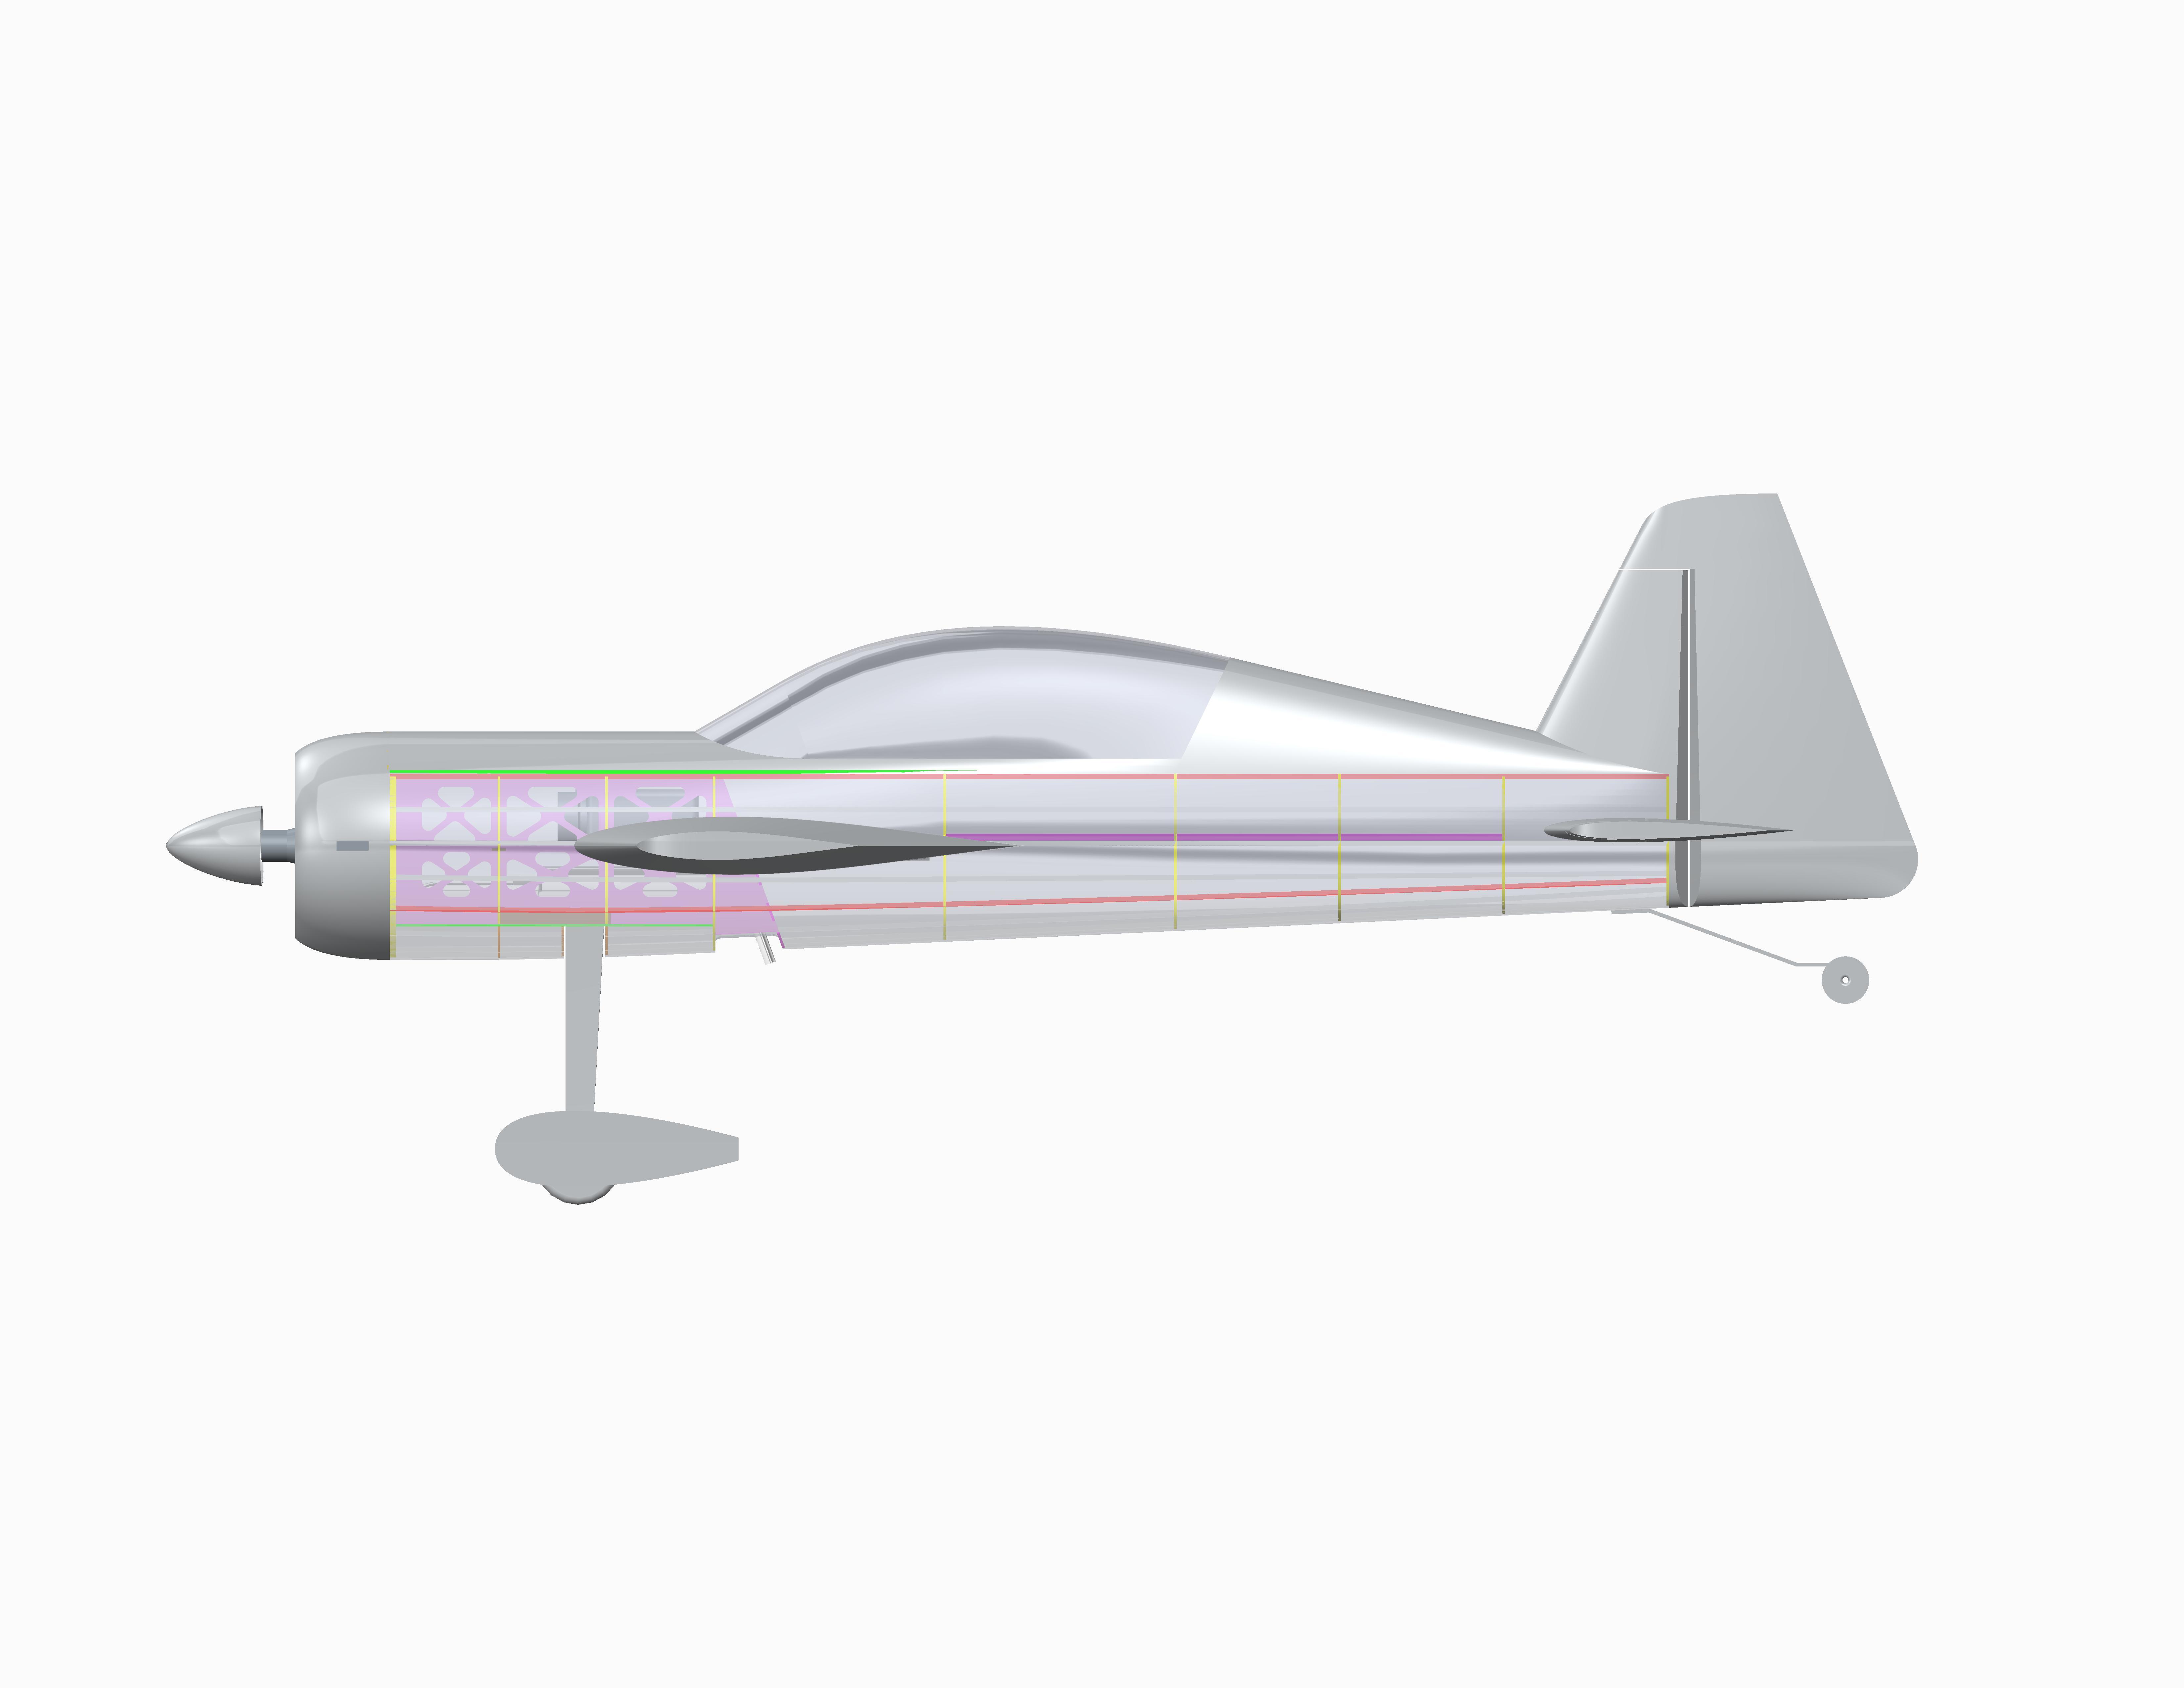 yak-54 3,0m cad-4